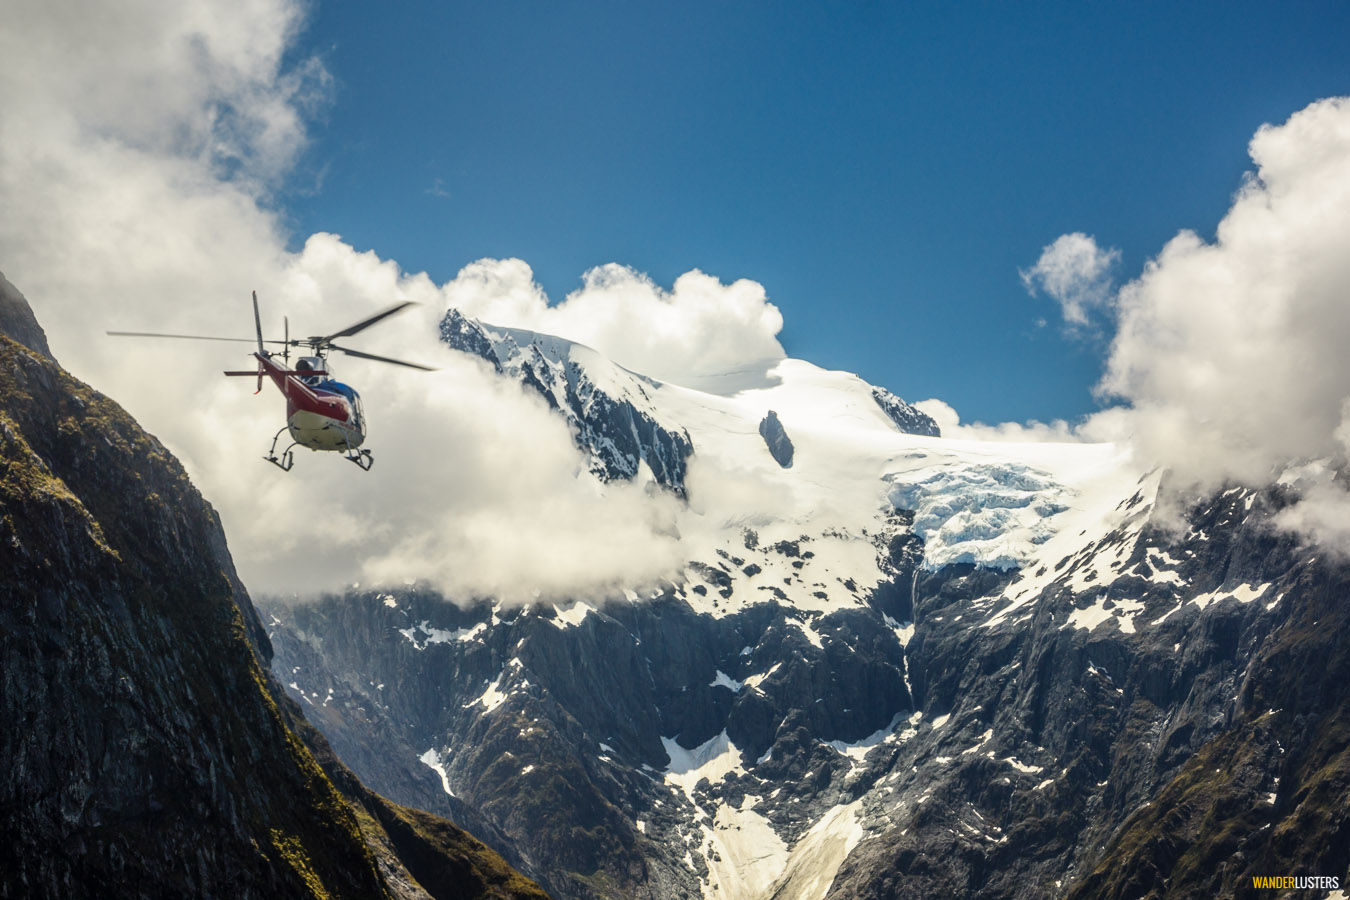 alpine escape helicopter-line-queenstown-glacier-flight